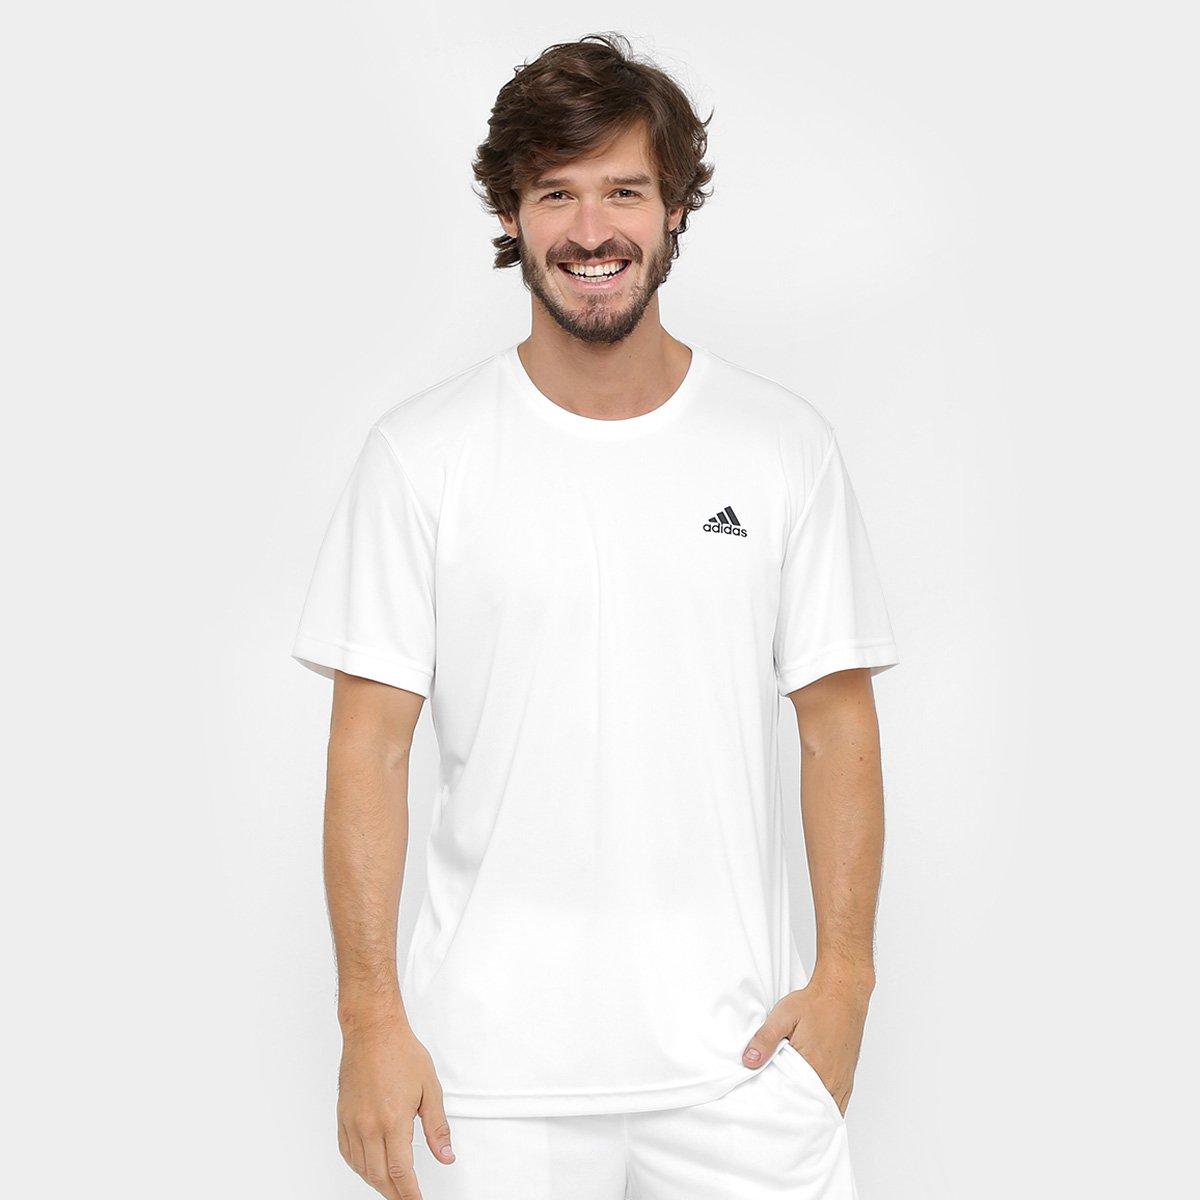 bd1dc13ce1f Camiseta Adidas Approach Masculina - Branco - Compre Agora